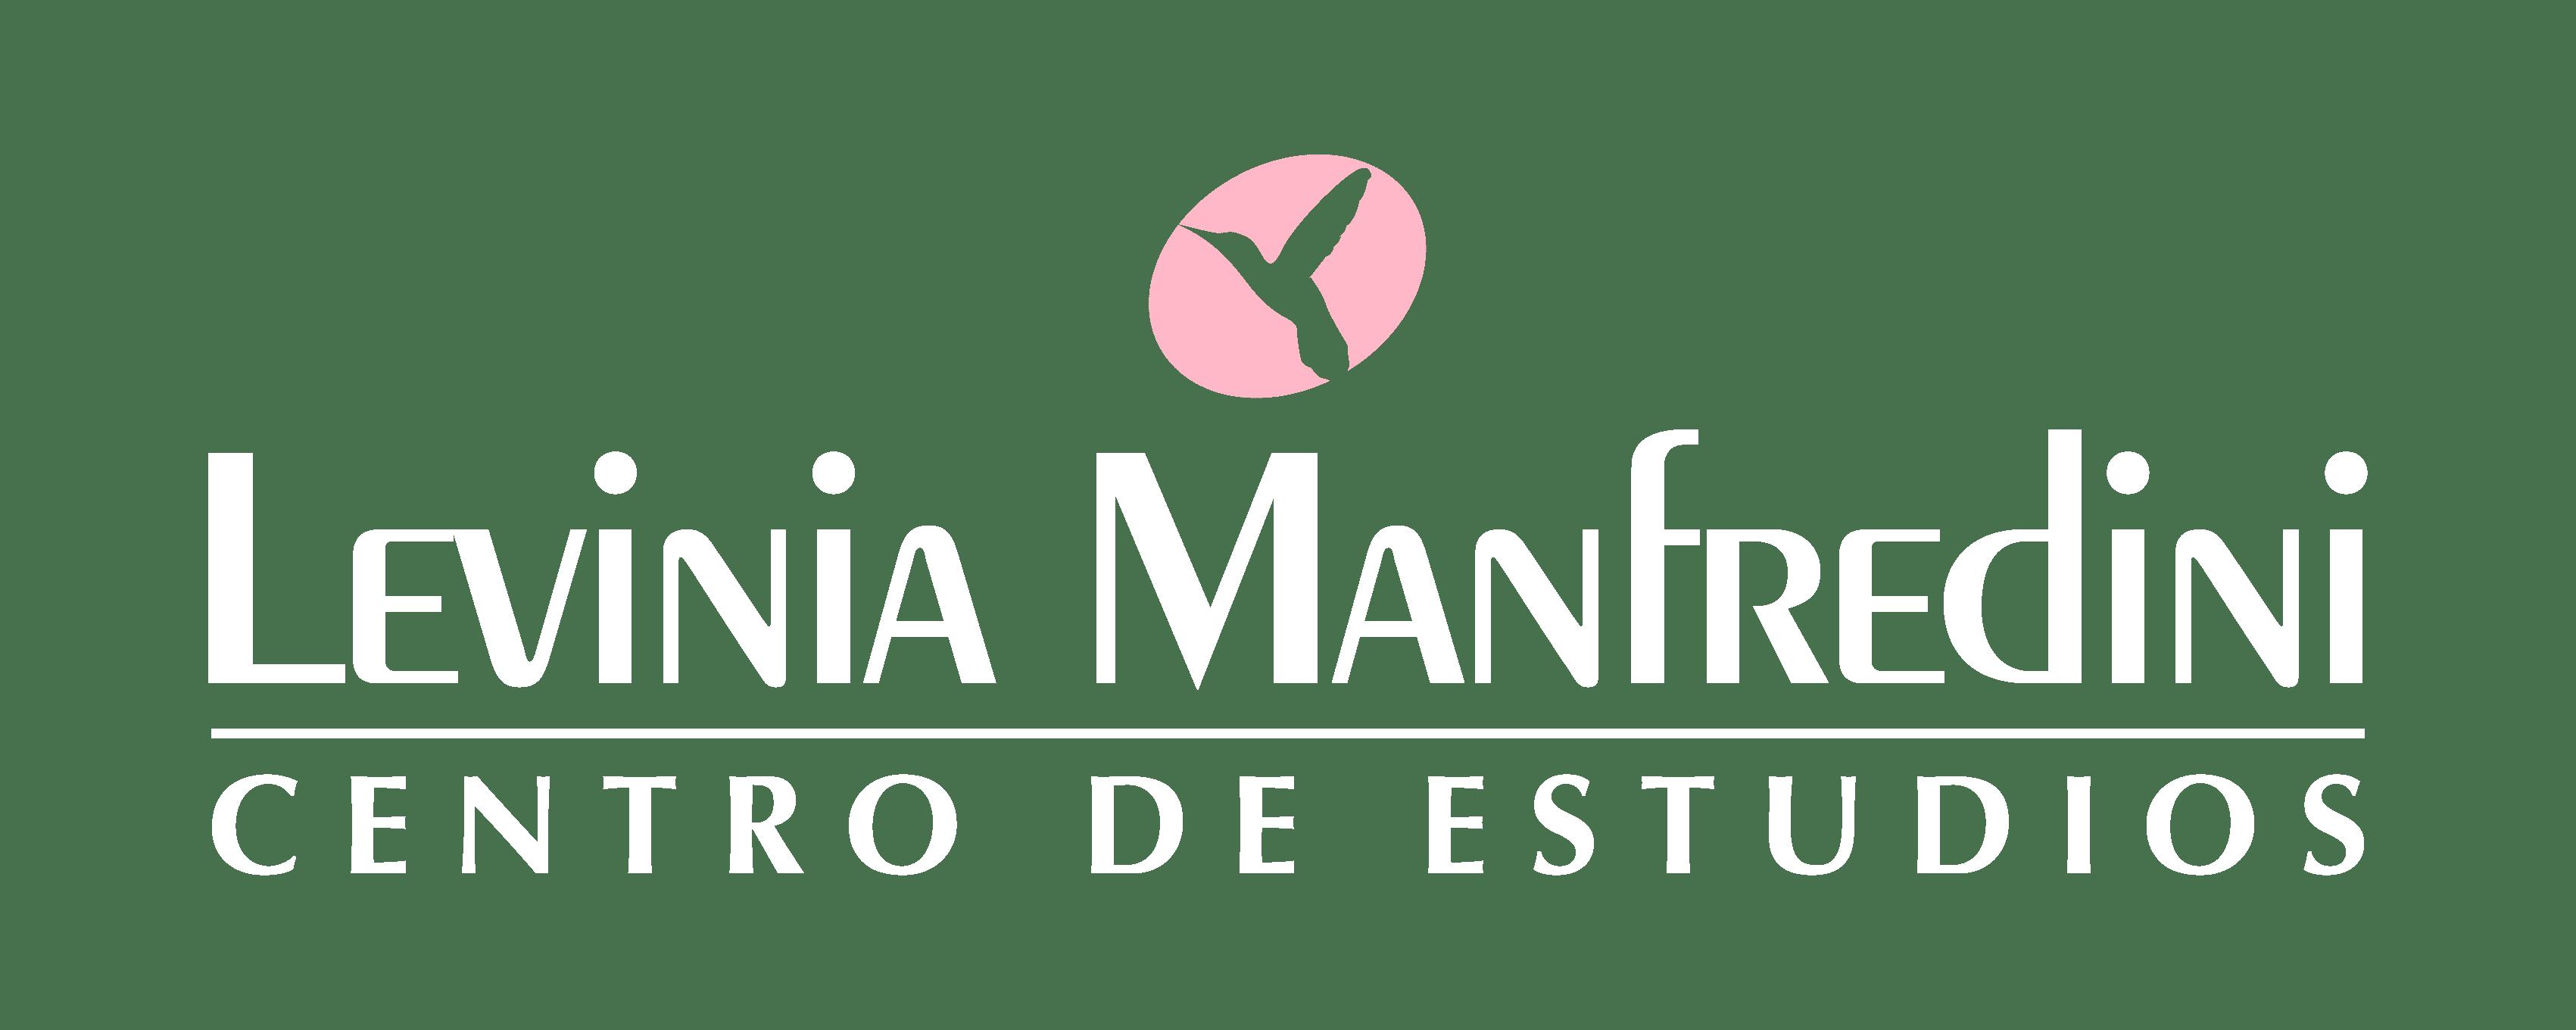 Levinia Manfredini